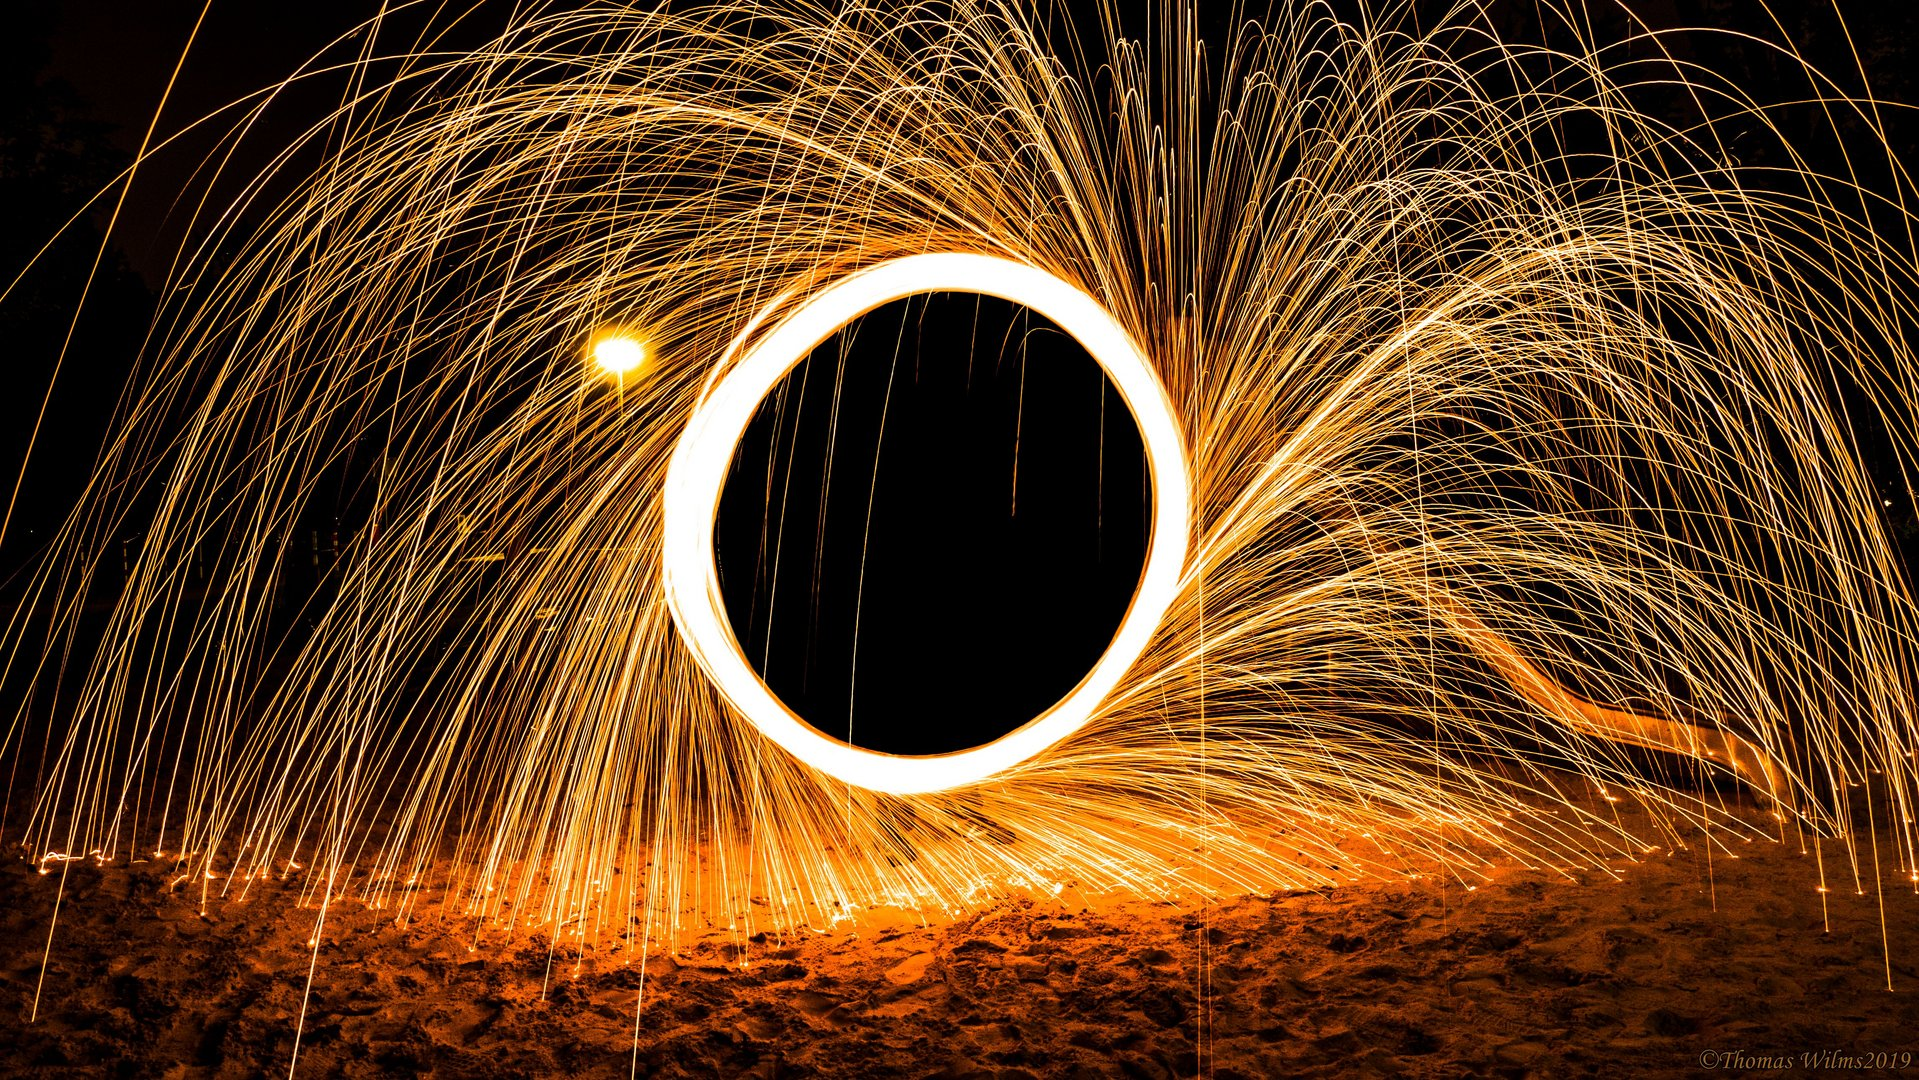 Feuerspirale